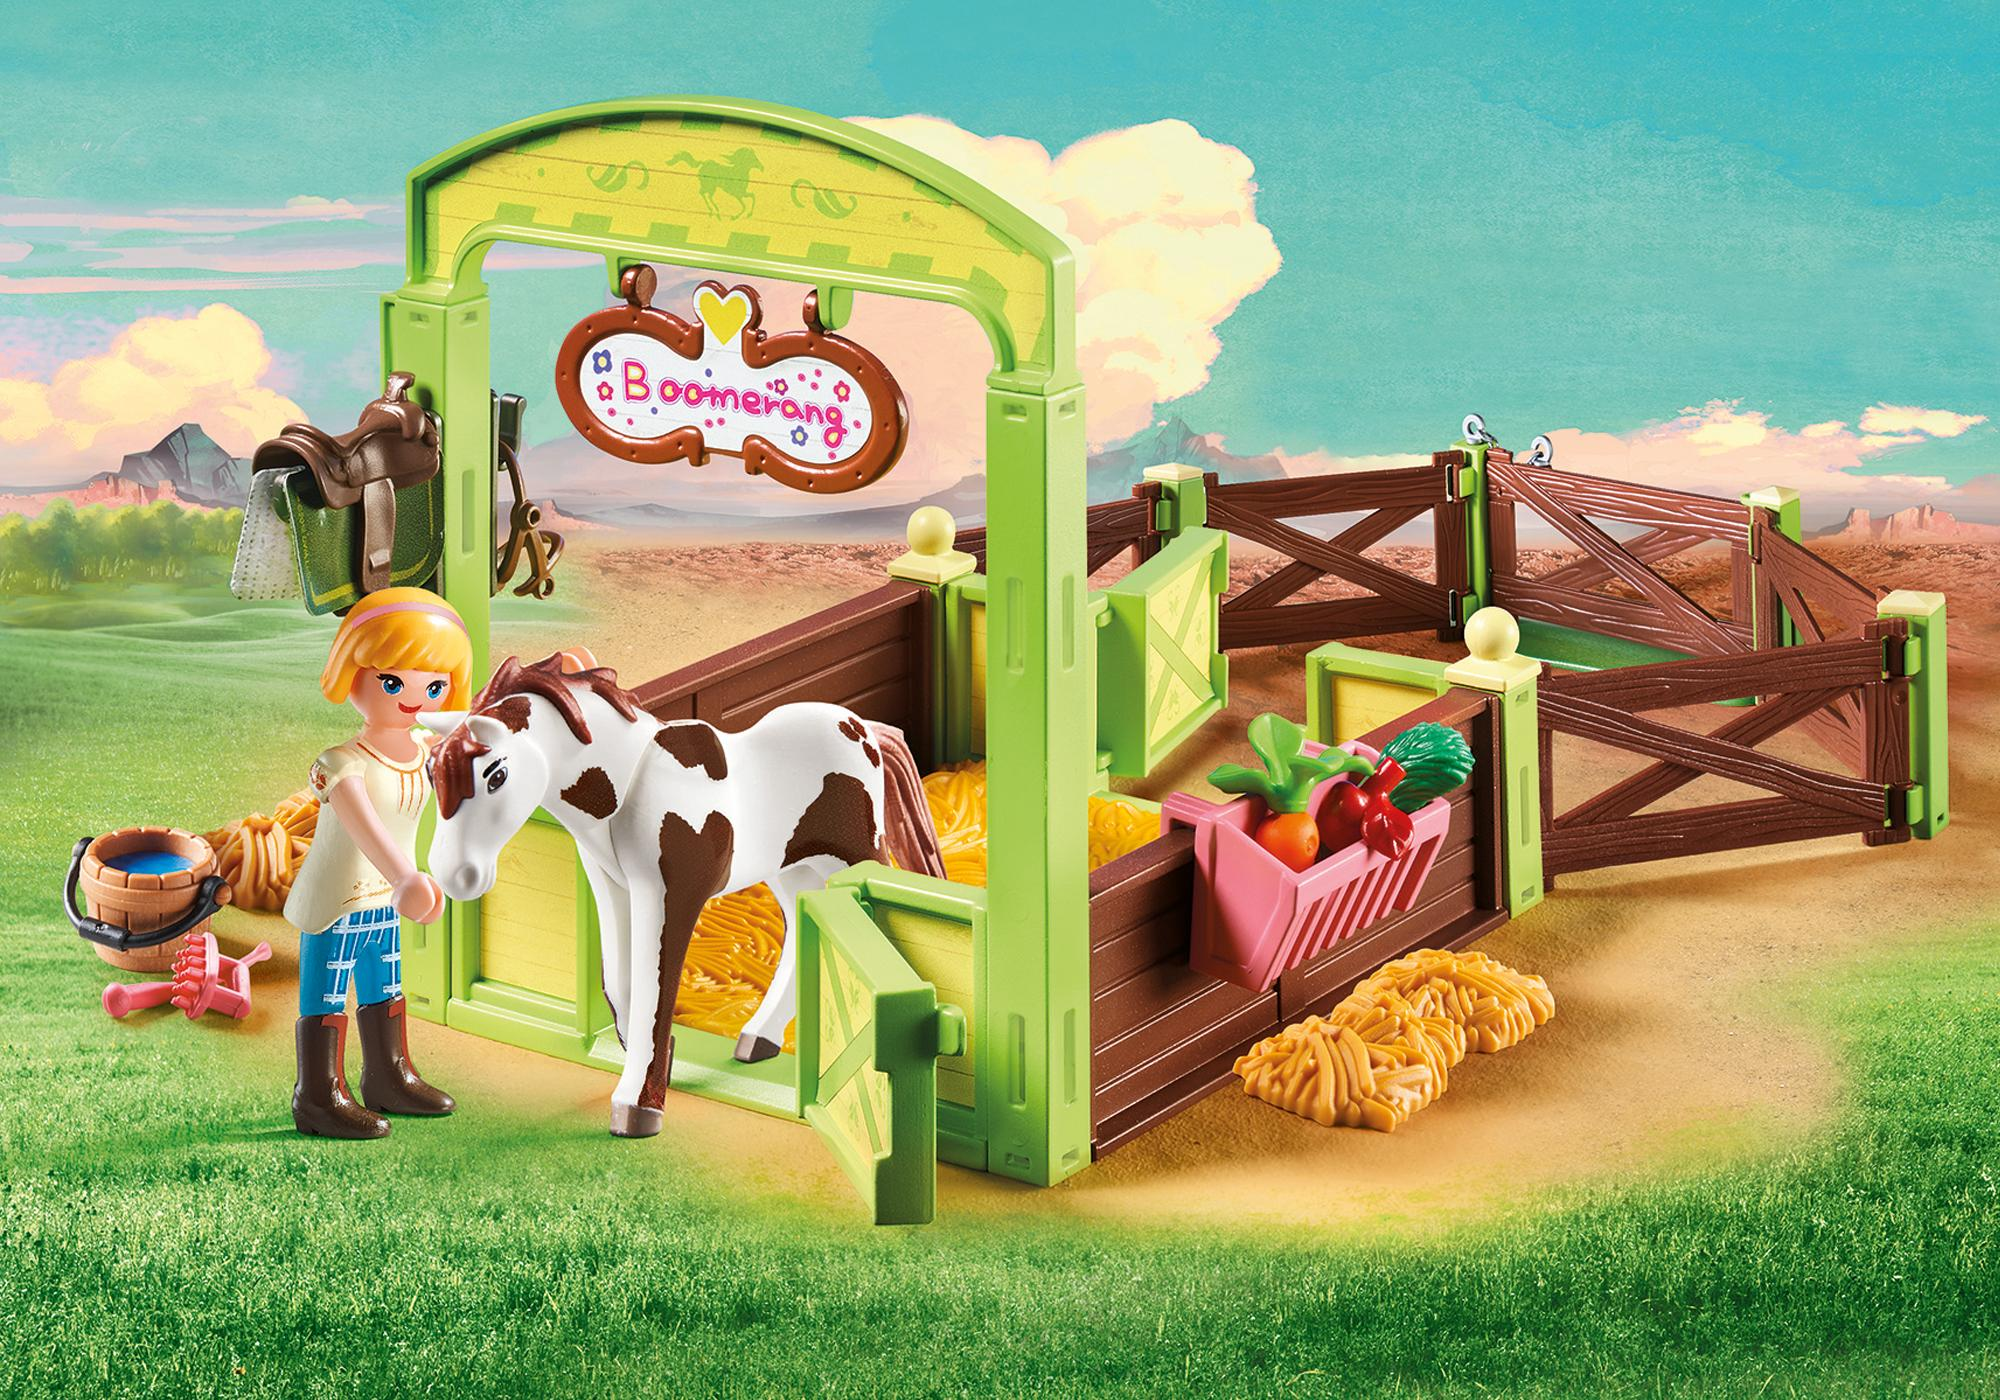 http://media.playmobil.com/i/playmobil/9480_product_detail/Estábulo 'Abigail e Boomerang'